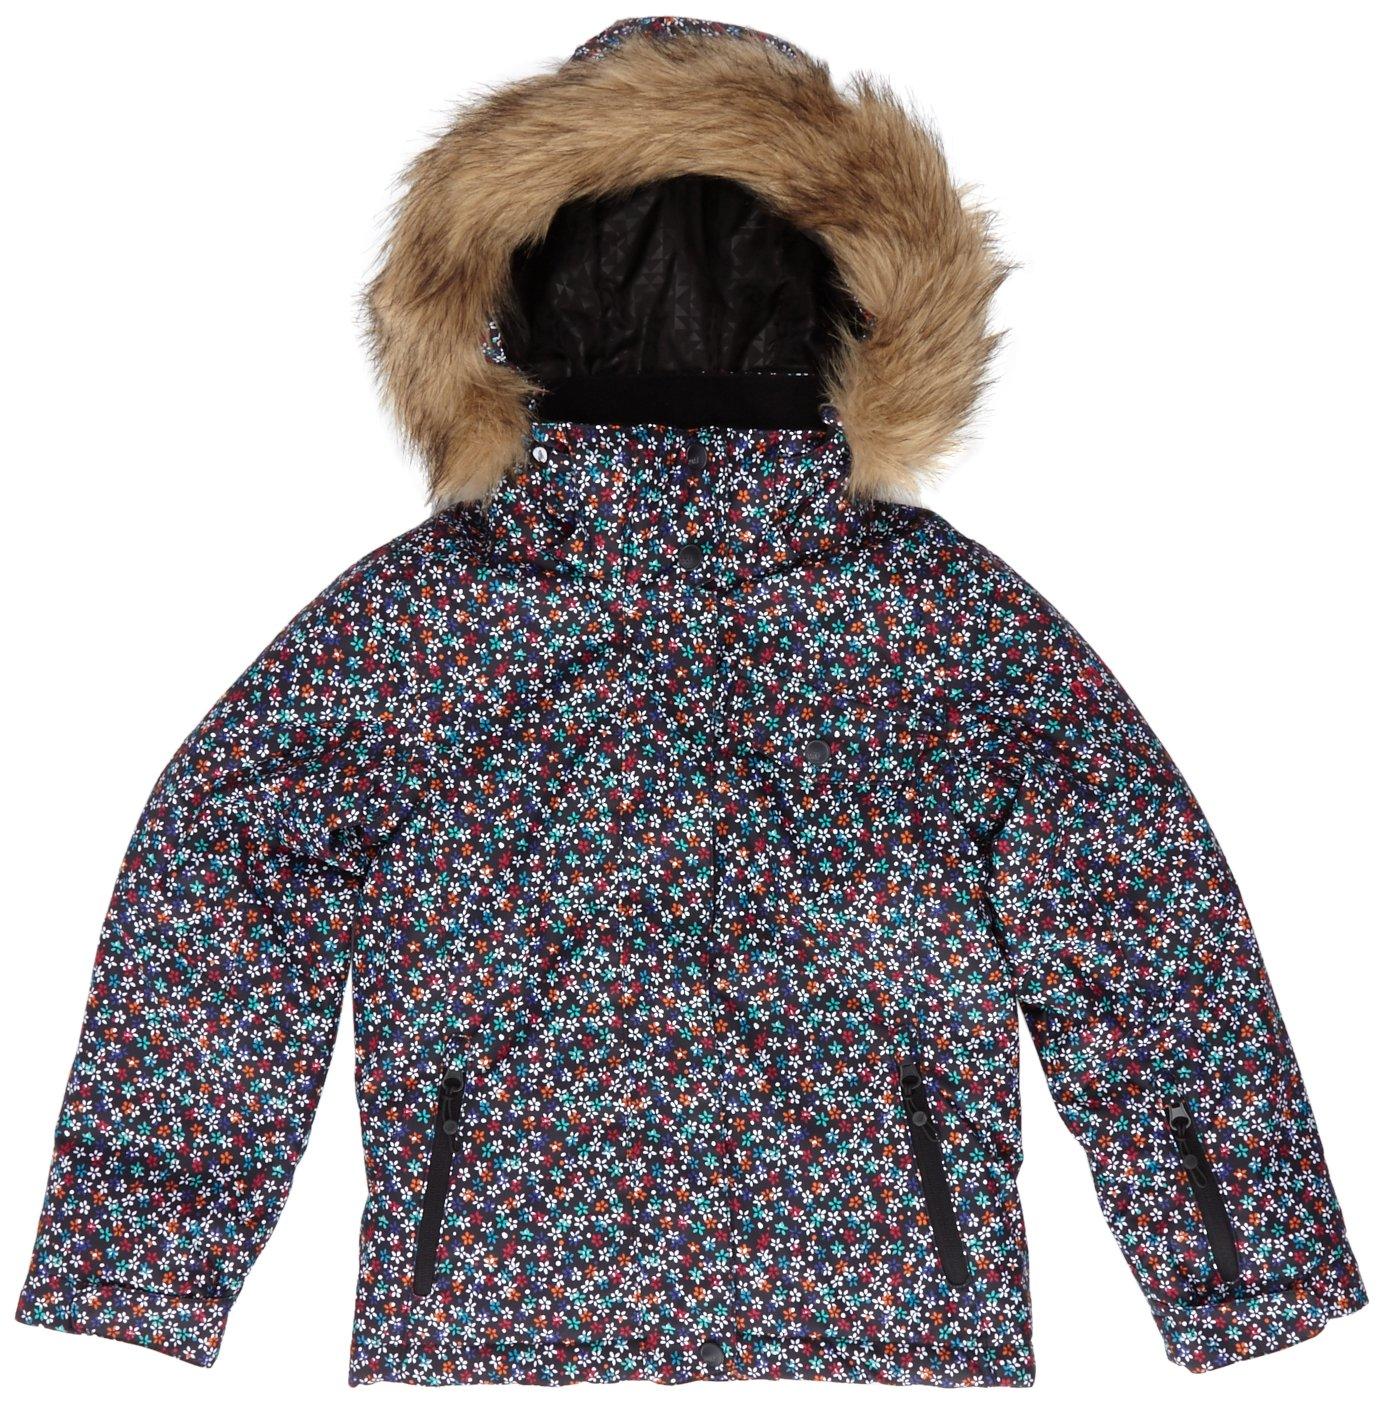 Roxy Mädchen Snowboardjacke Jet Ski Girl Jk Roses Are Roxy jetzt bestellen